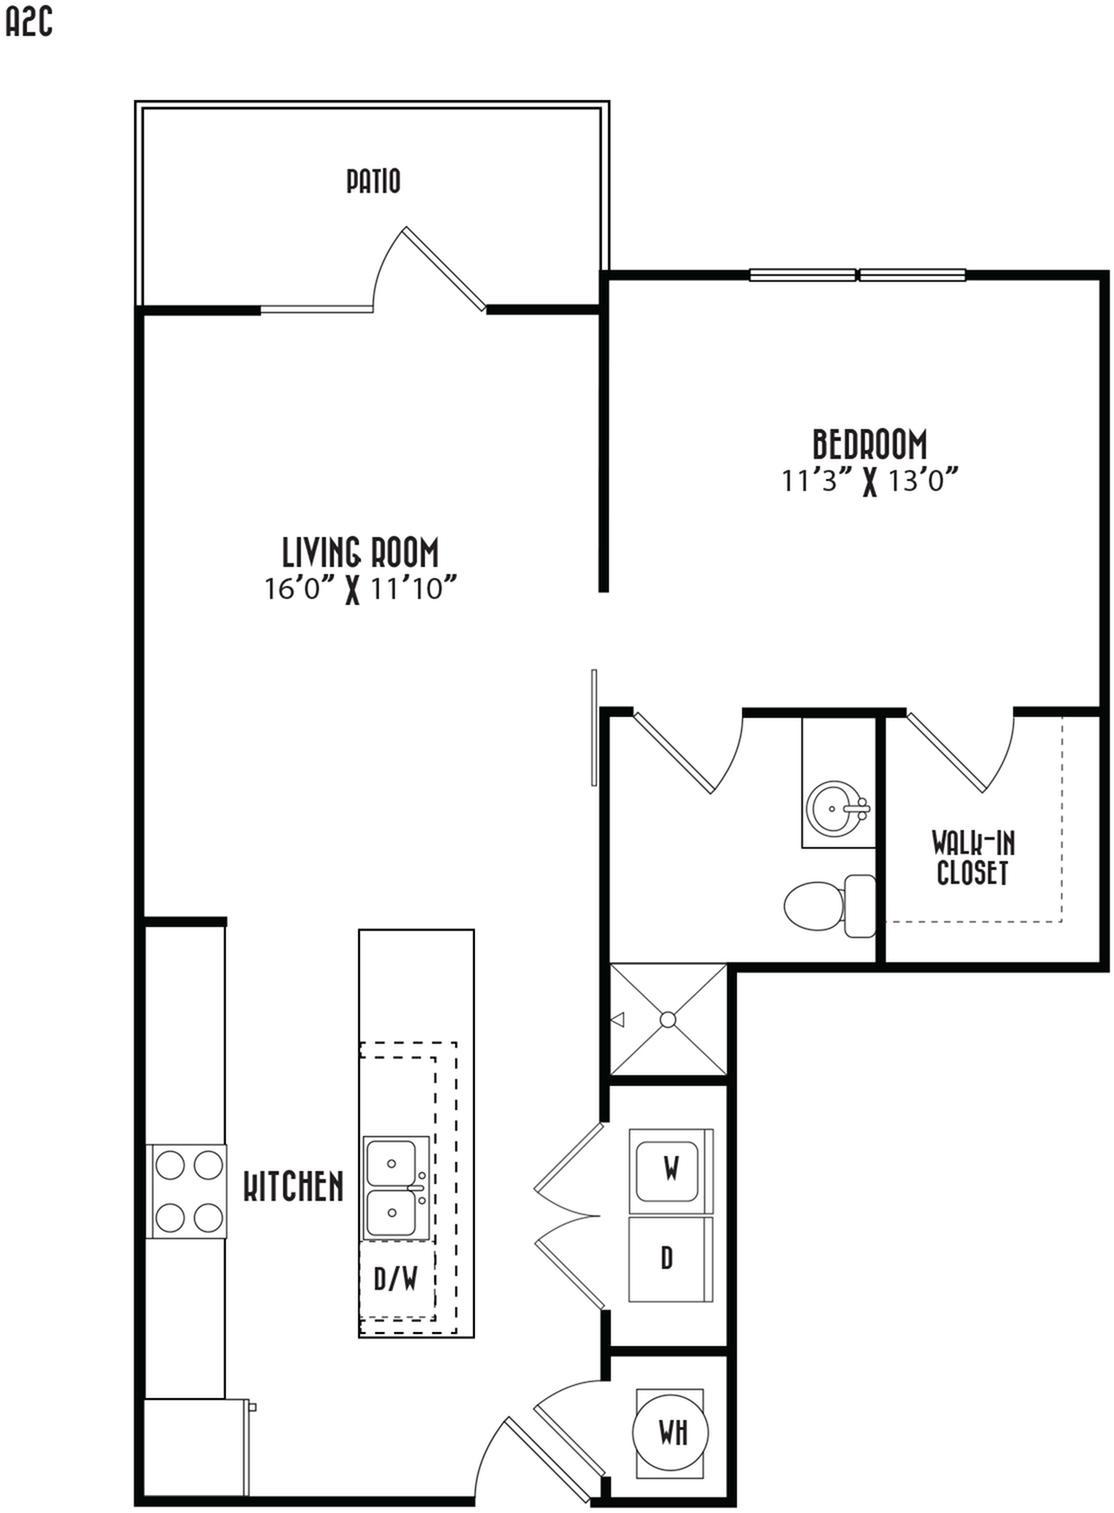 A2C Floor Plan Image